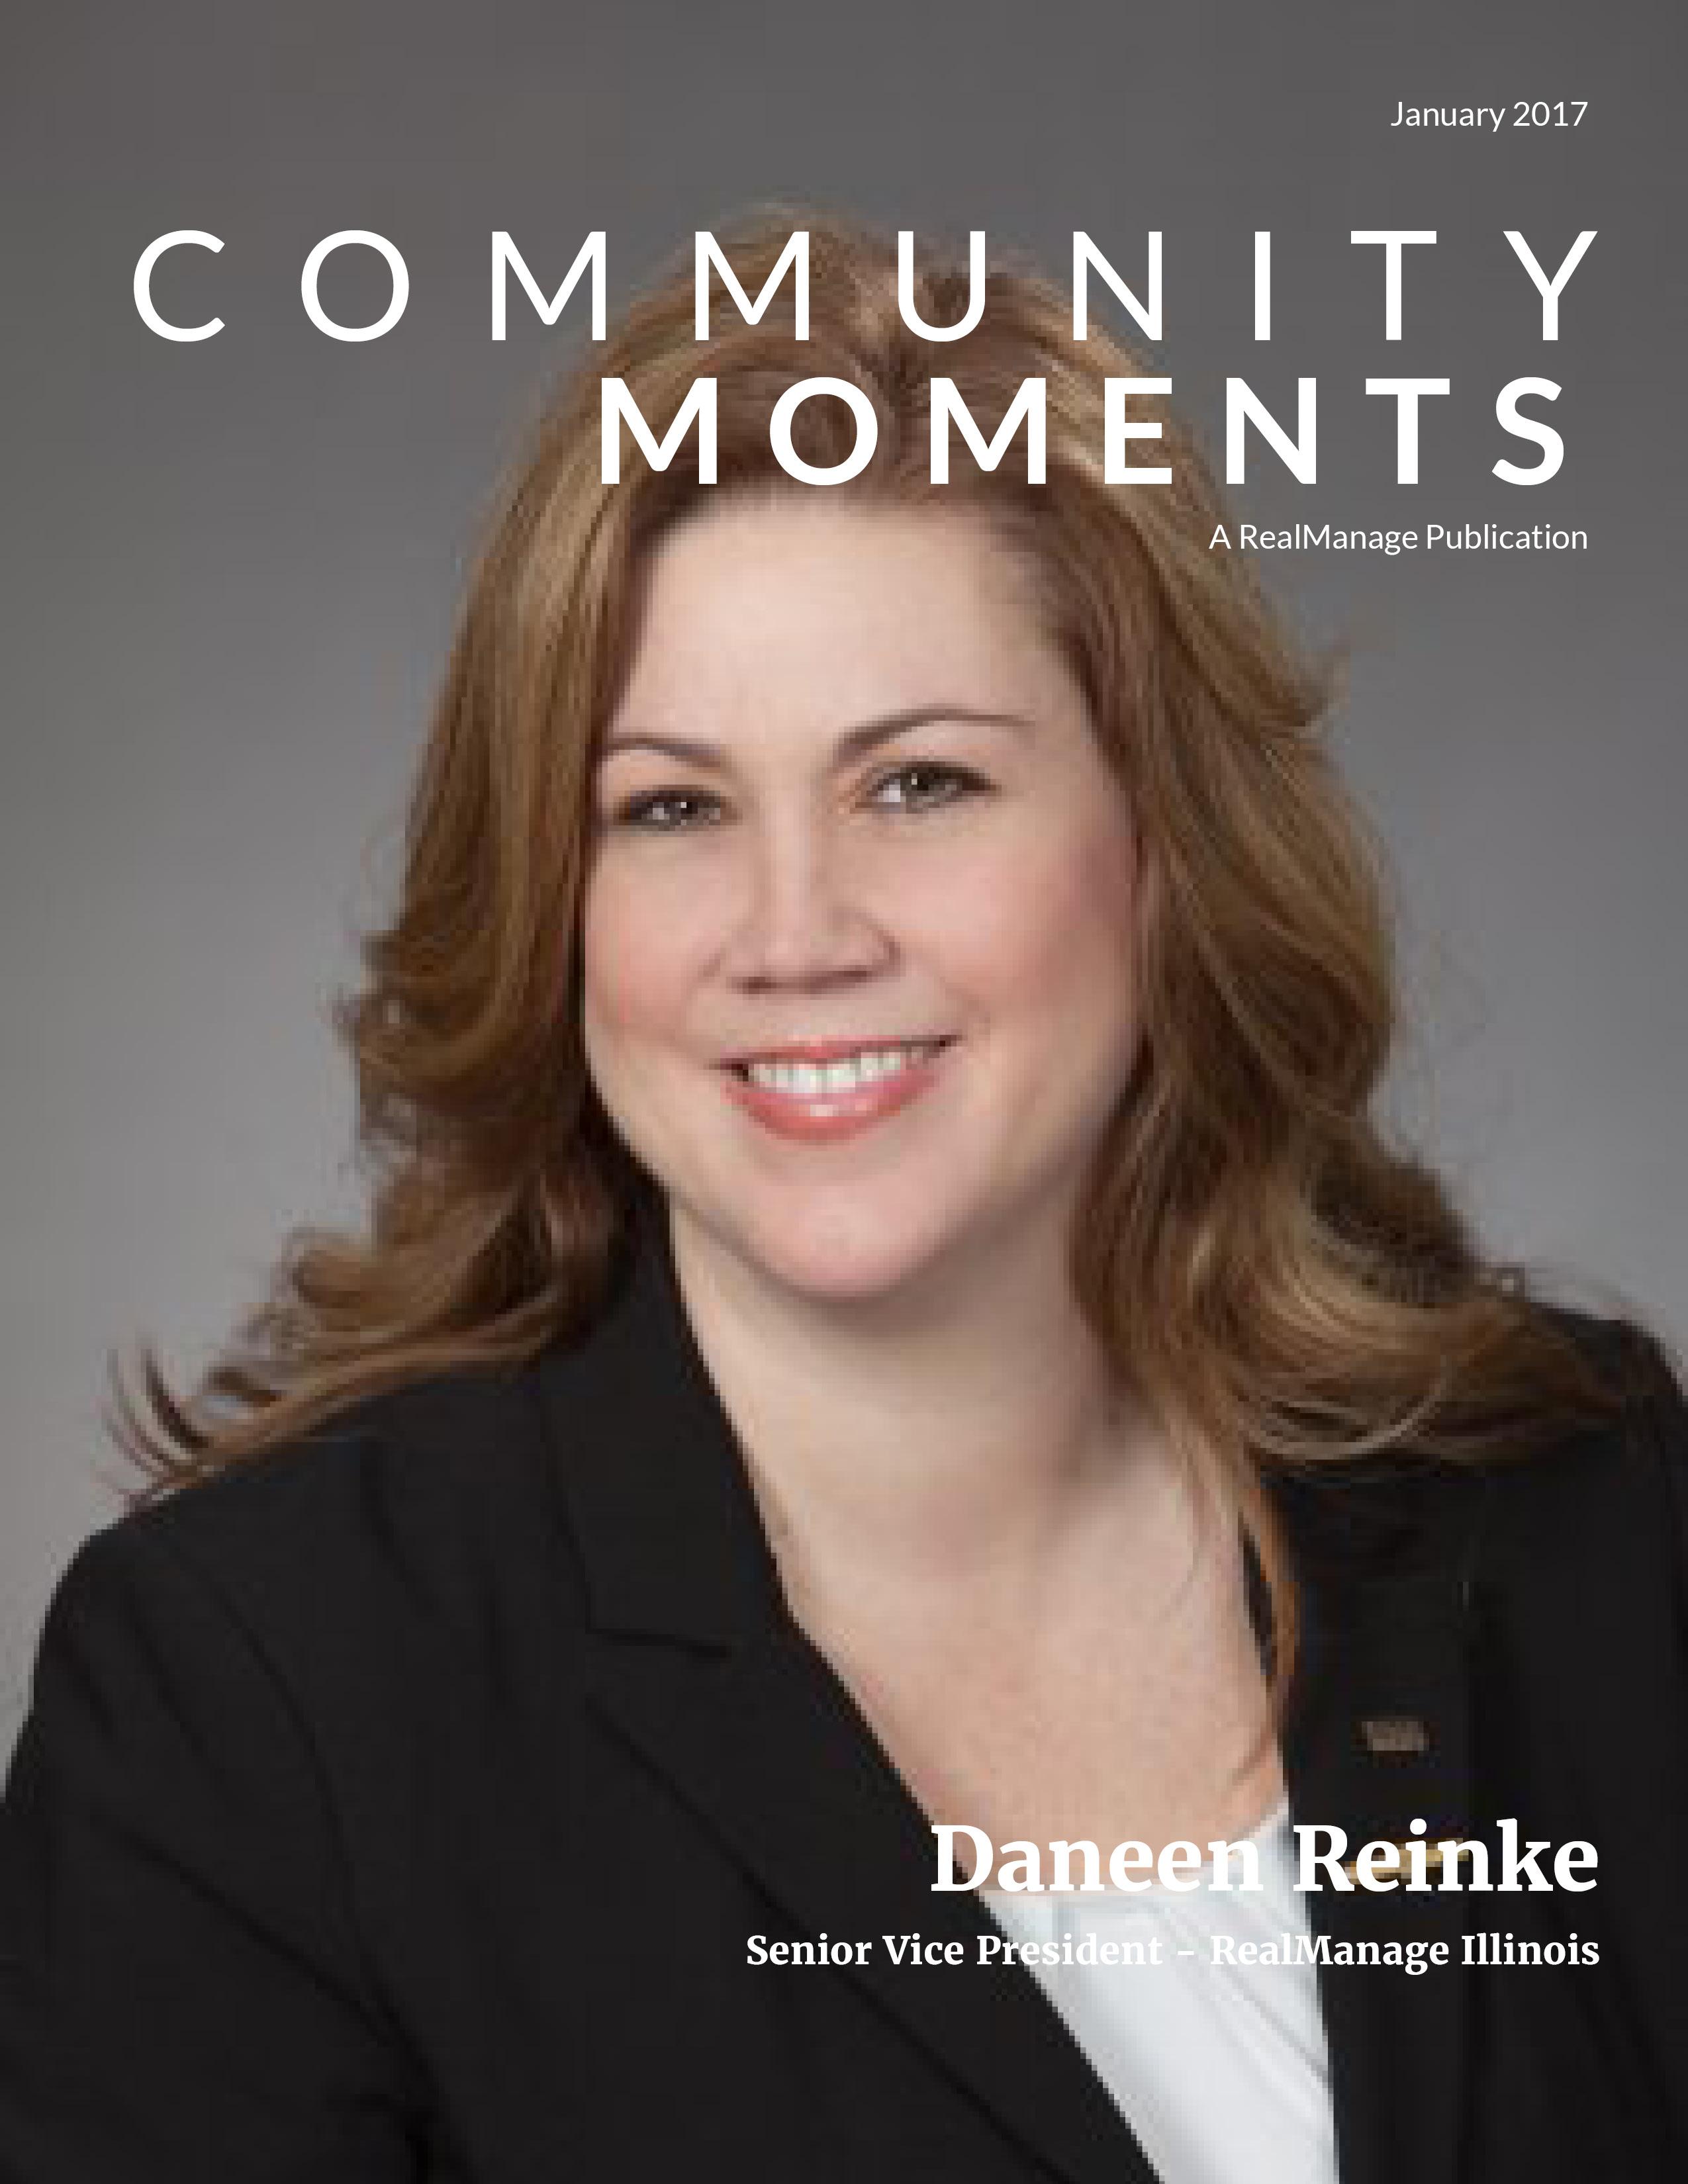 January 2017_Issue 8_Community Moments.1jpg.jpg